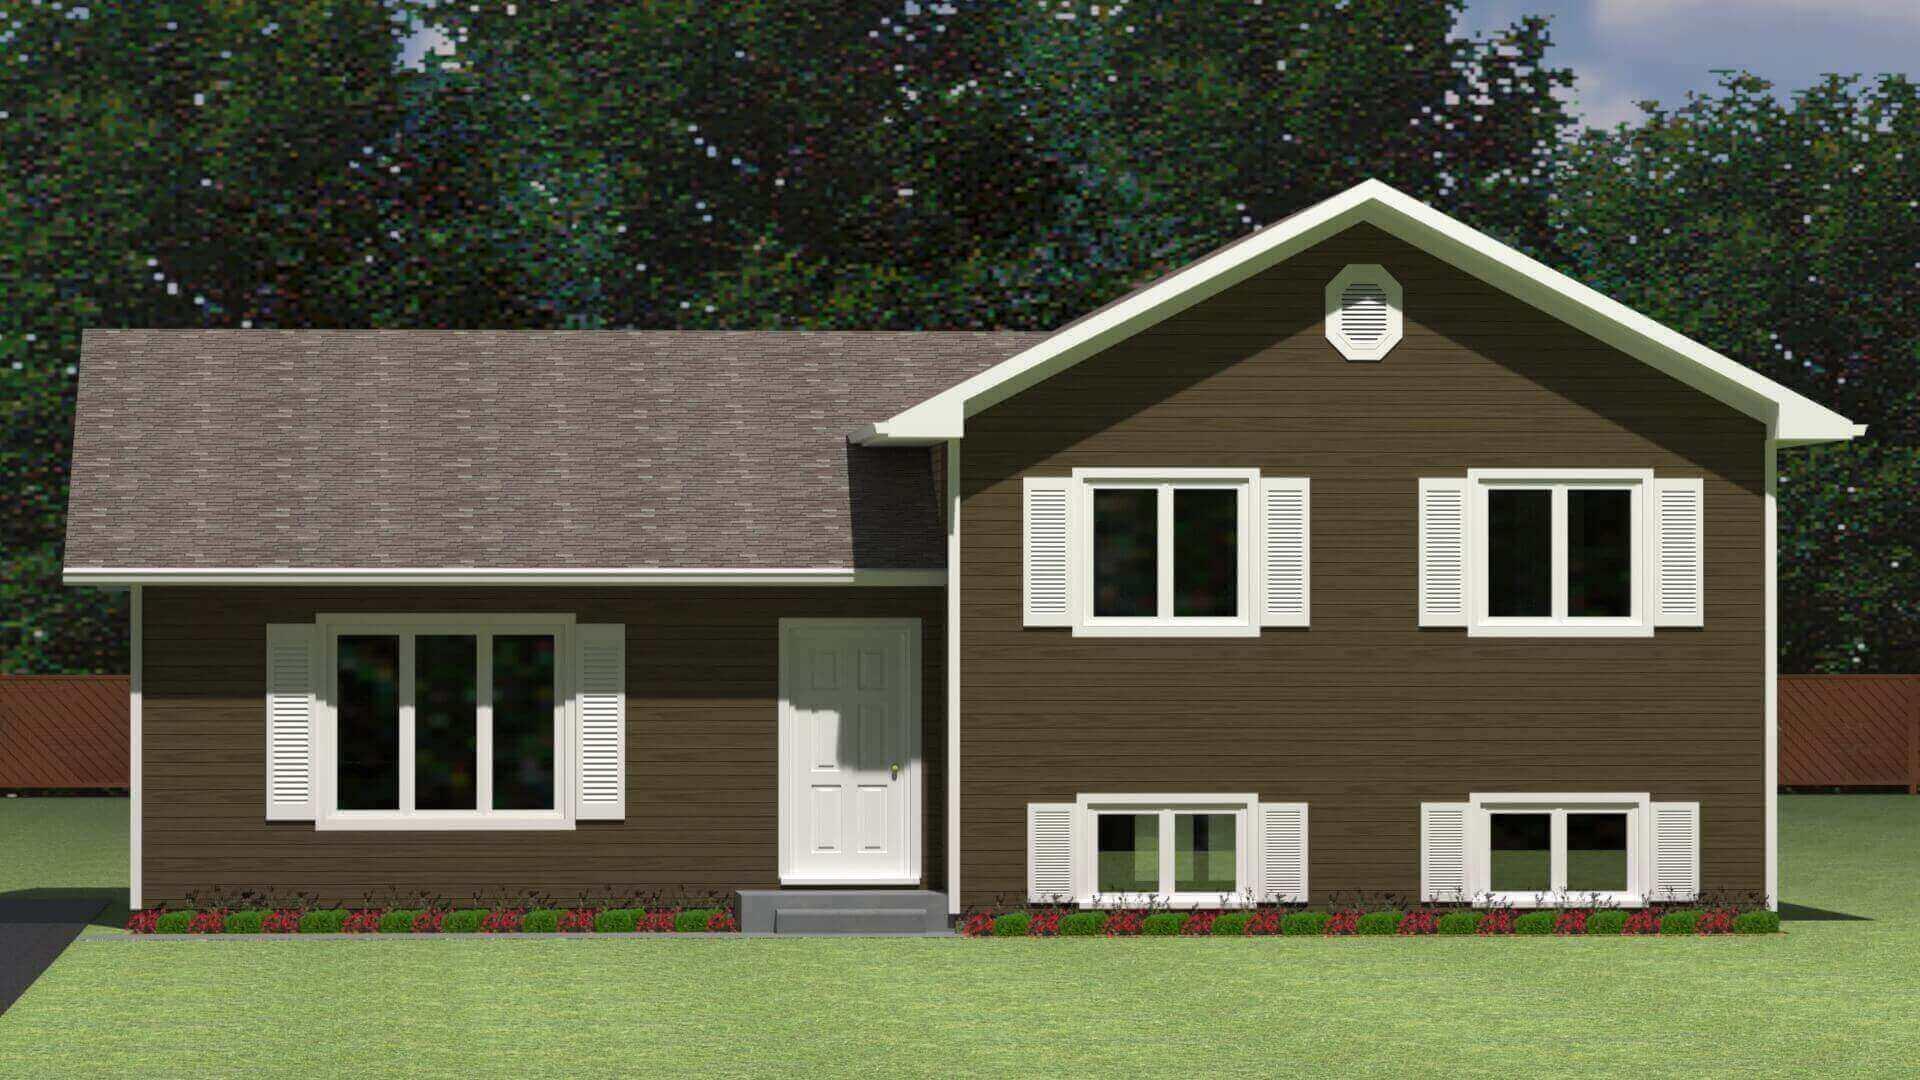 1188_house elevation